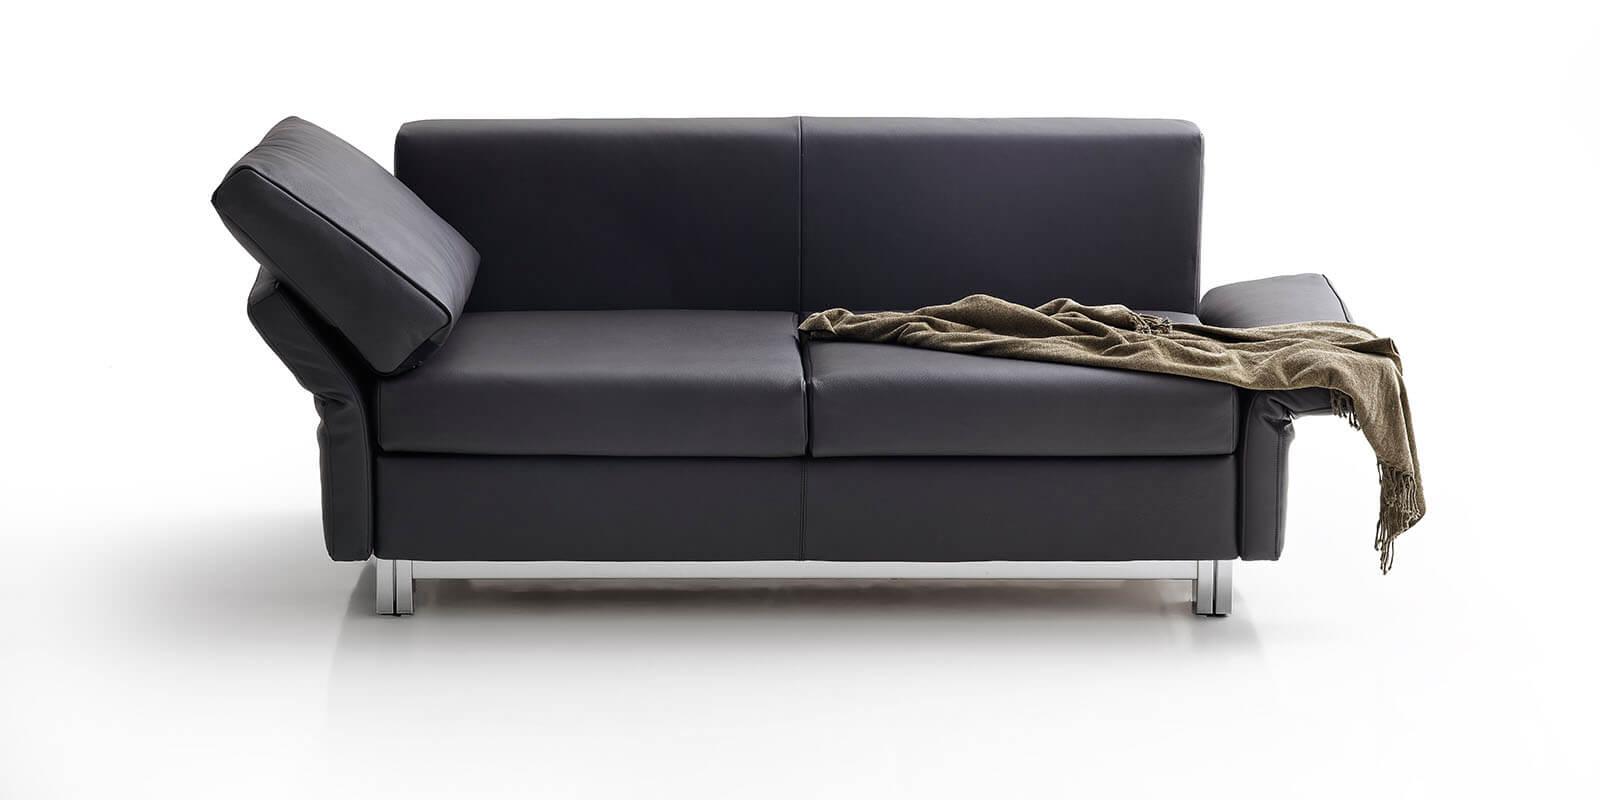 Schmale Sofas cubismo sofa bed